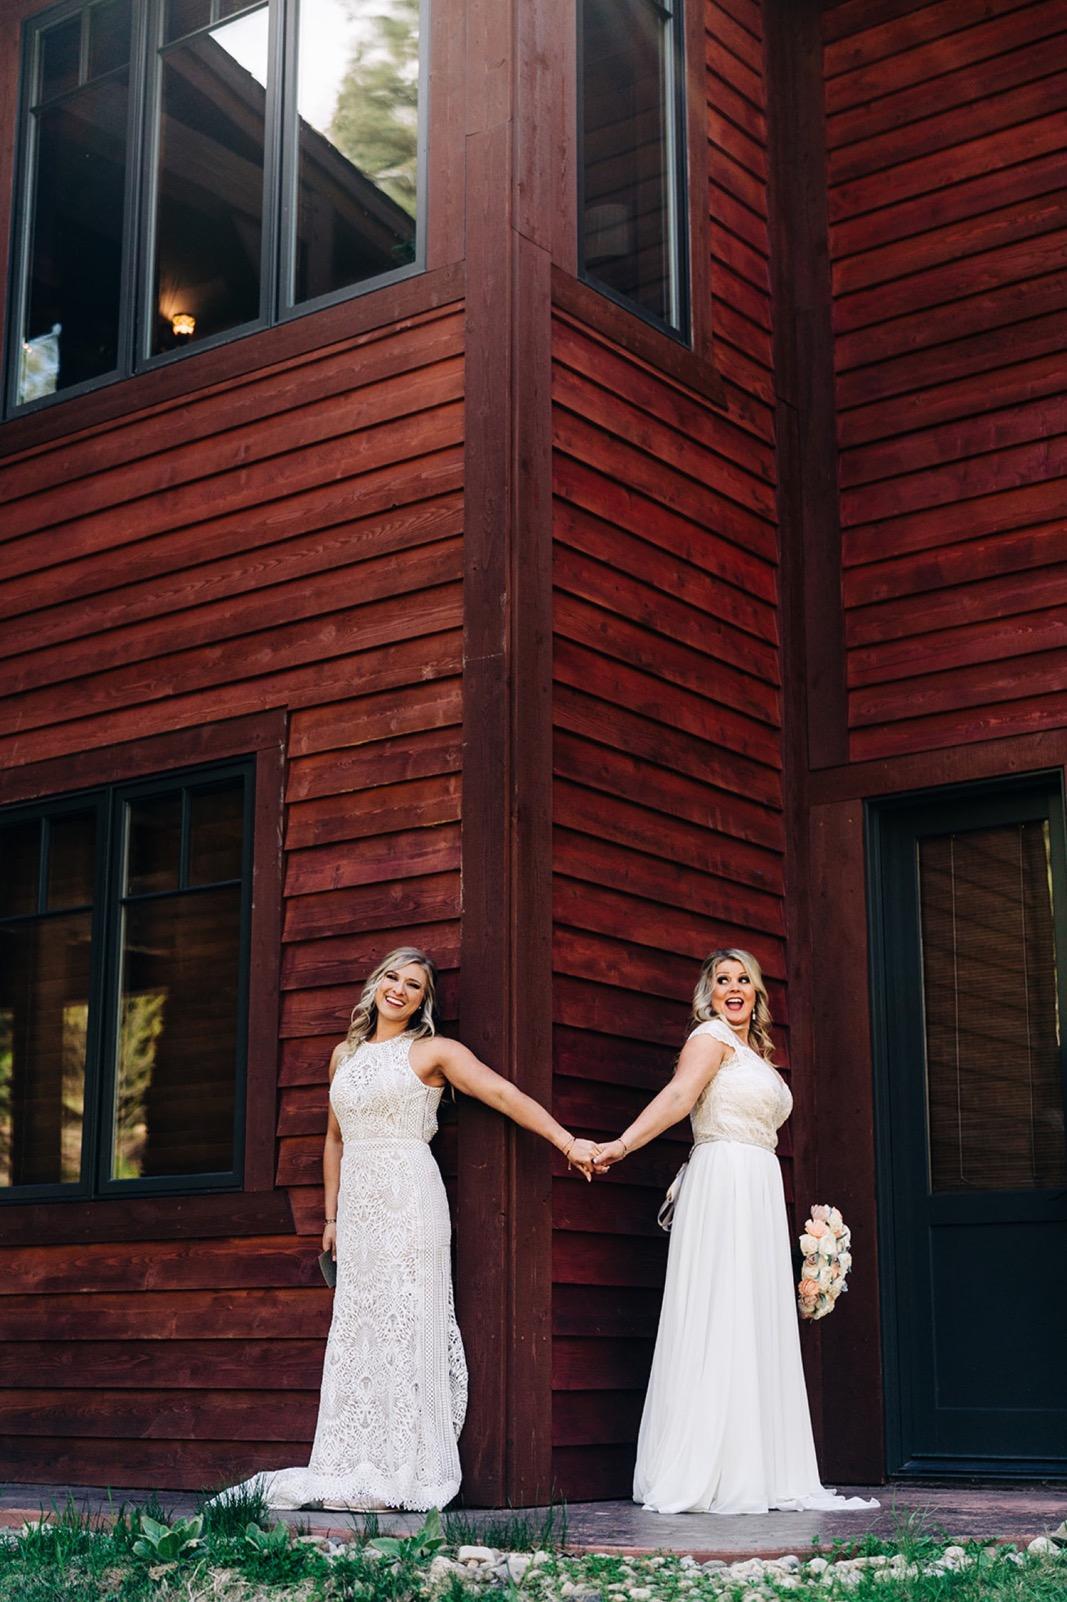 041_falissa_heather_wedding-109.jpg